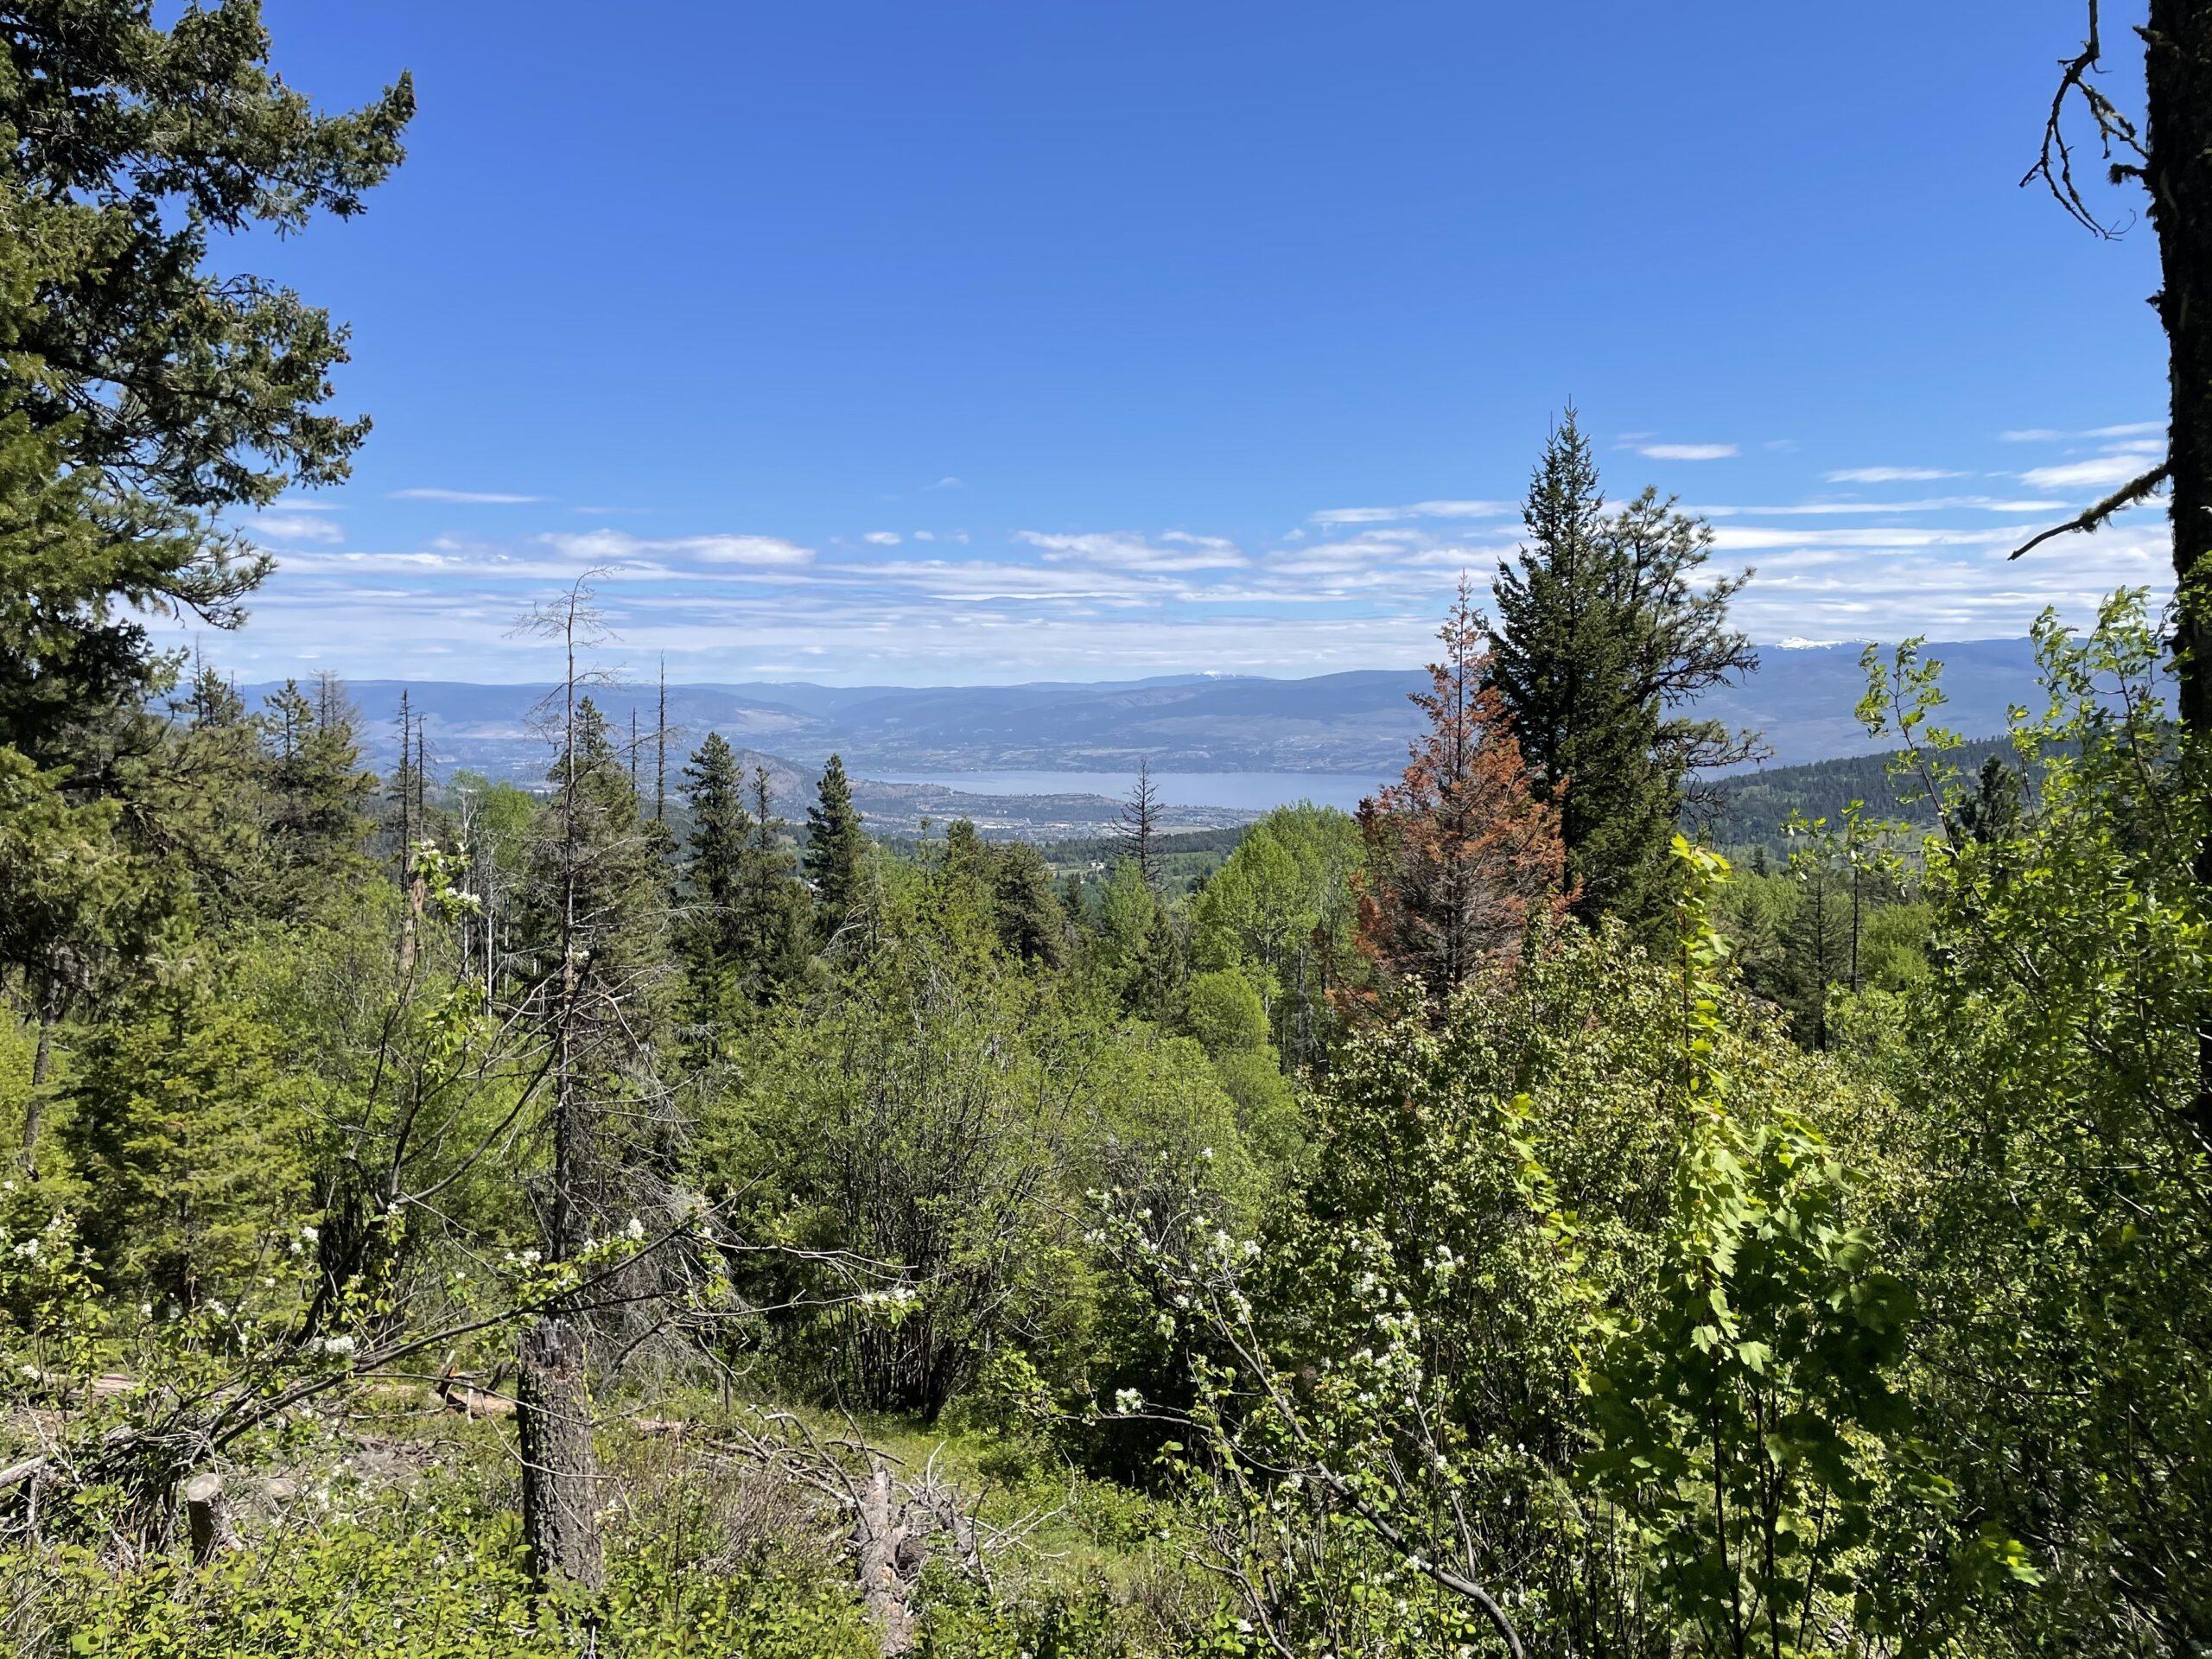 Okanagan Lake from Panorama Trail